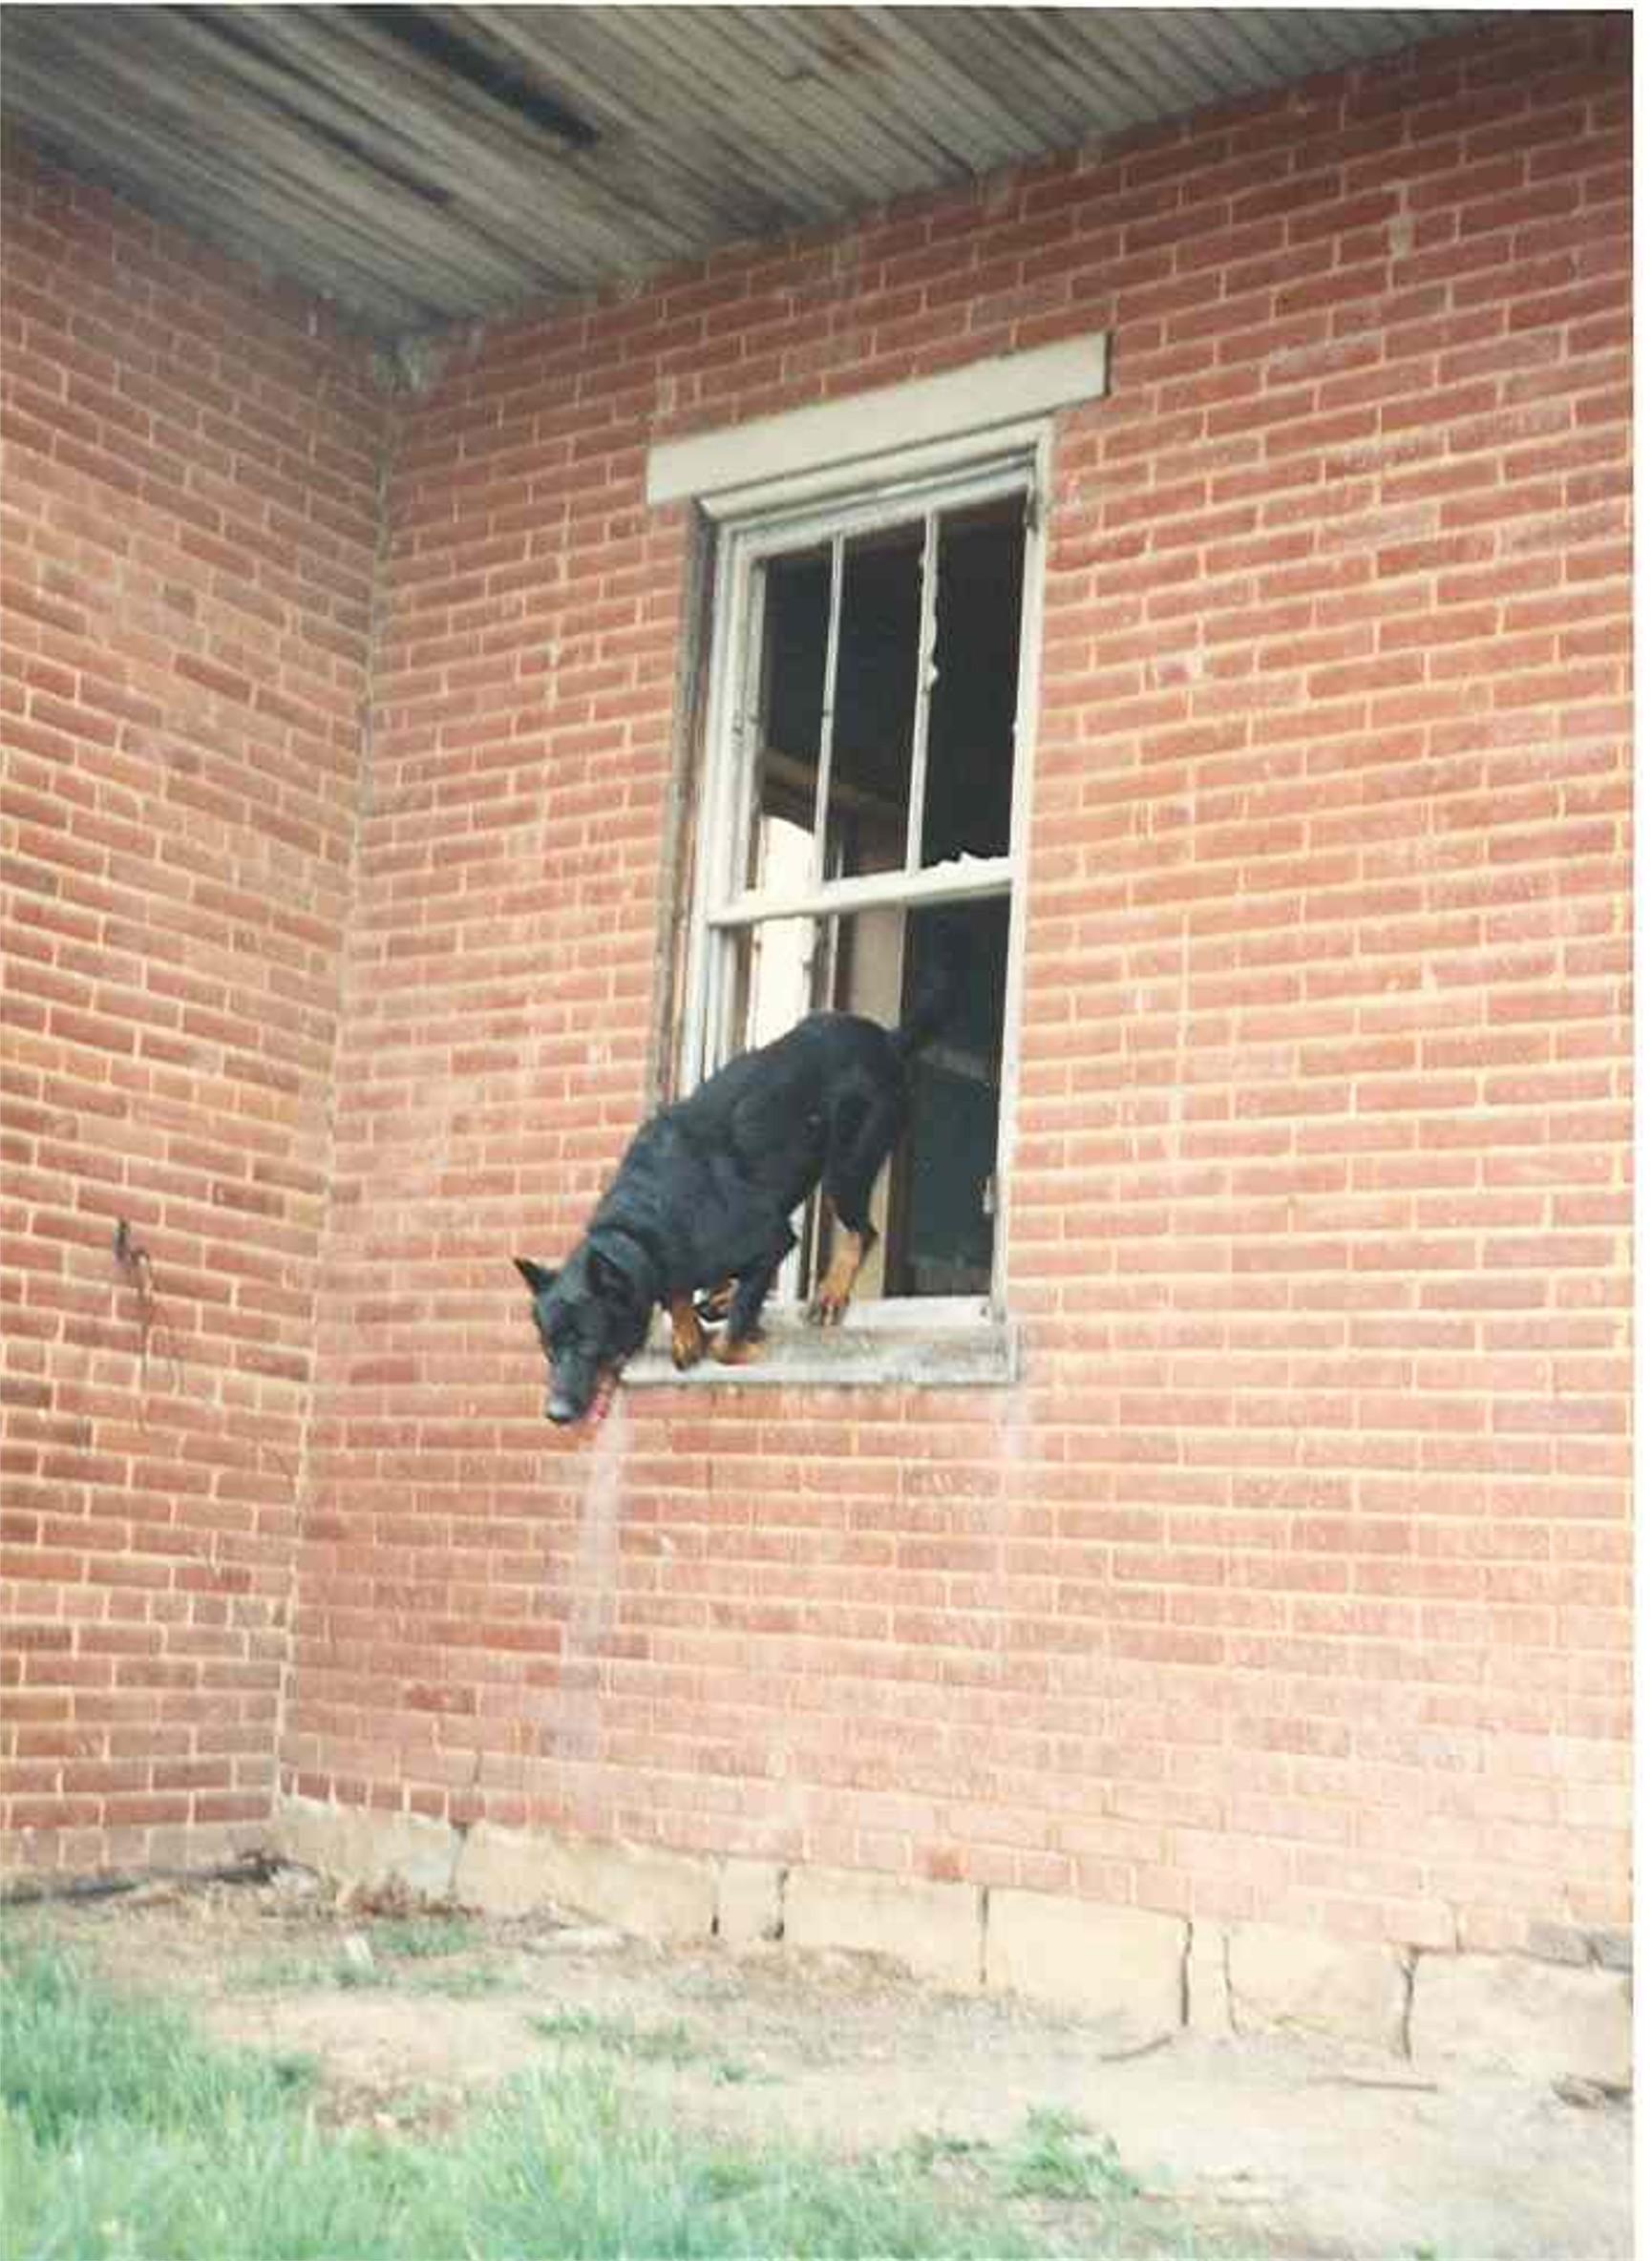 Scout SAR training window